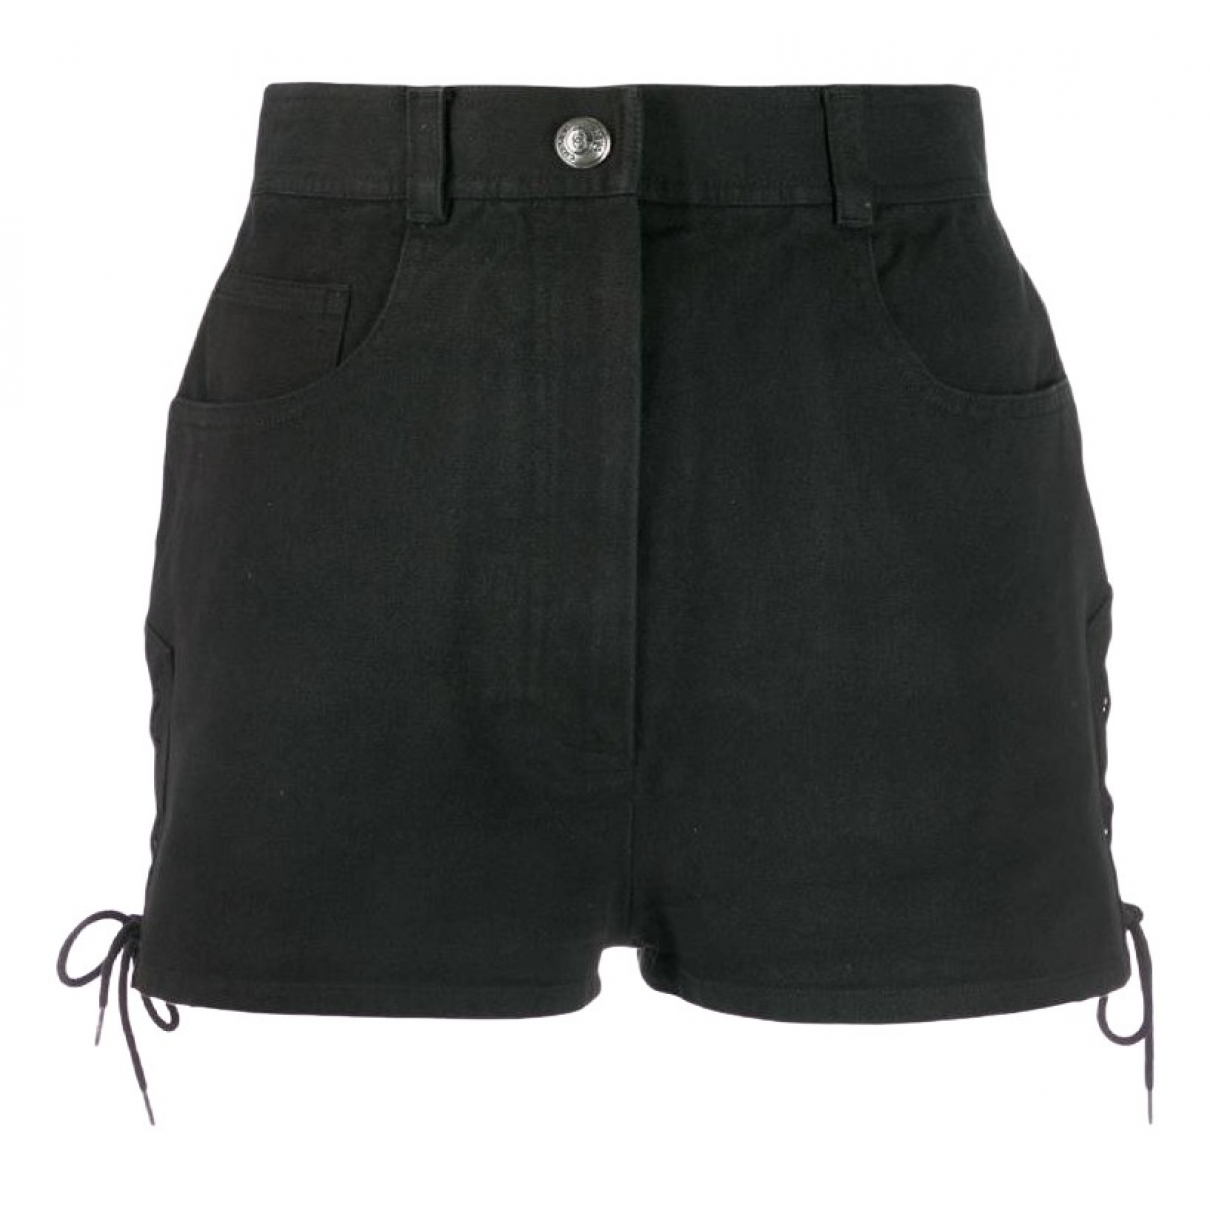 Short Chanel